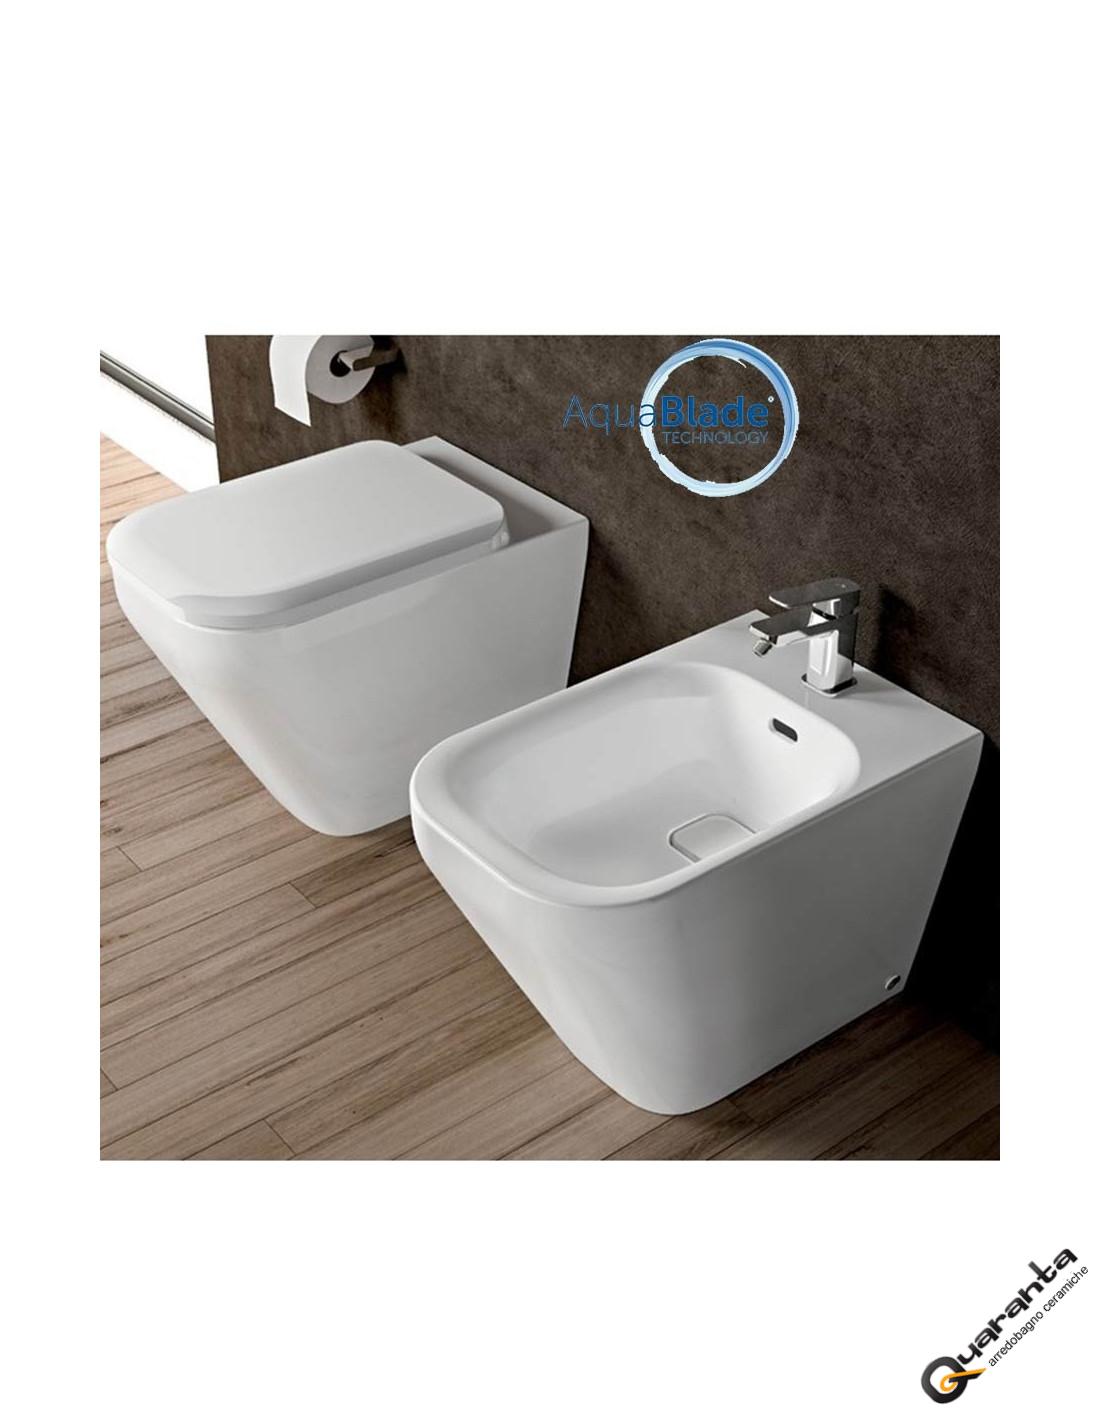 Accessori Sanitari Ideal Standard.Ideal Standard Tonic Ii Sanitari Filomuro Tonic Ii Quaranta Ceramiche